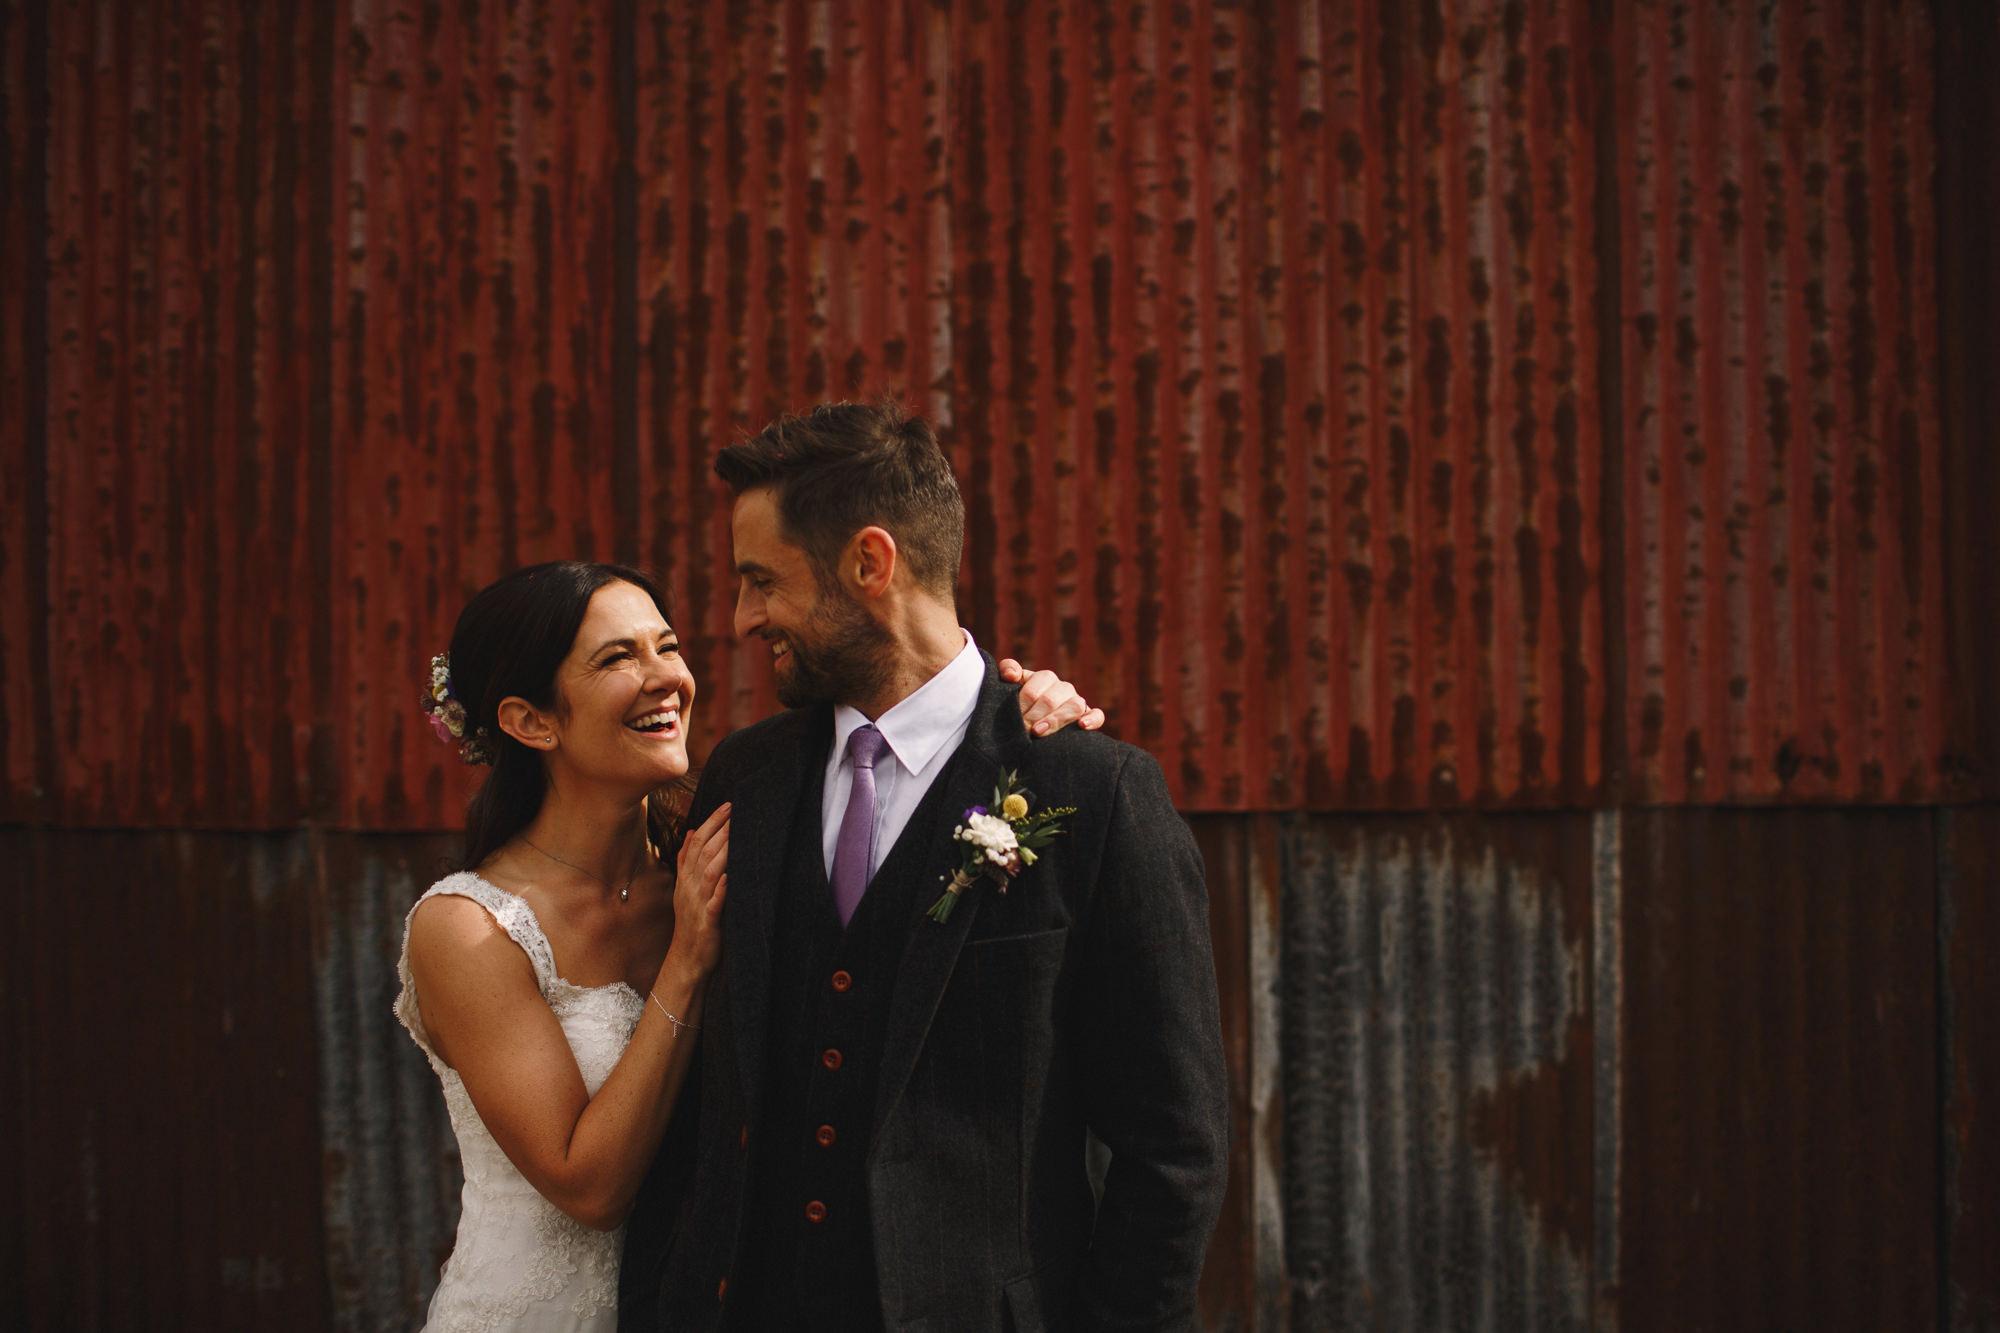 Walcot hall wedding photography shropshire 24